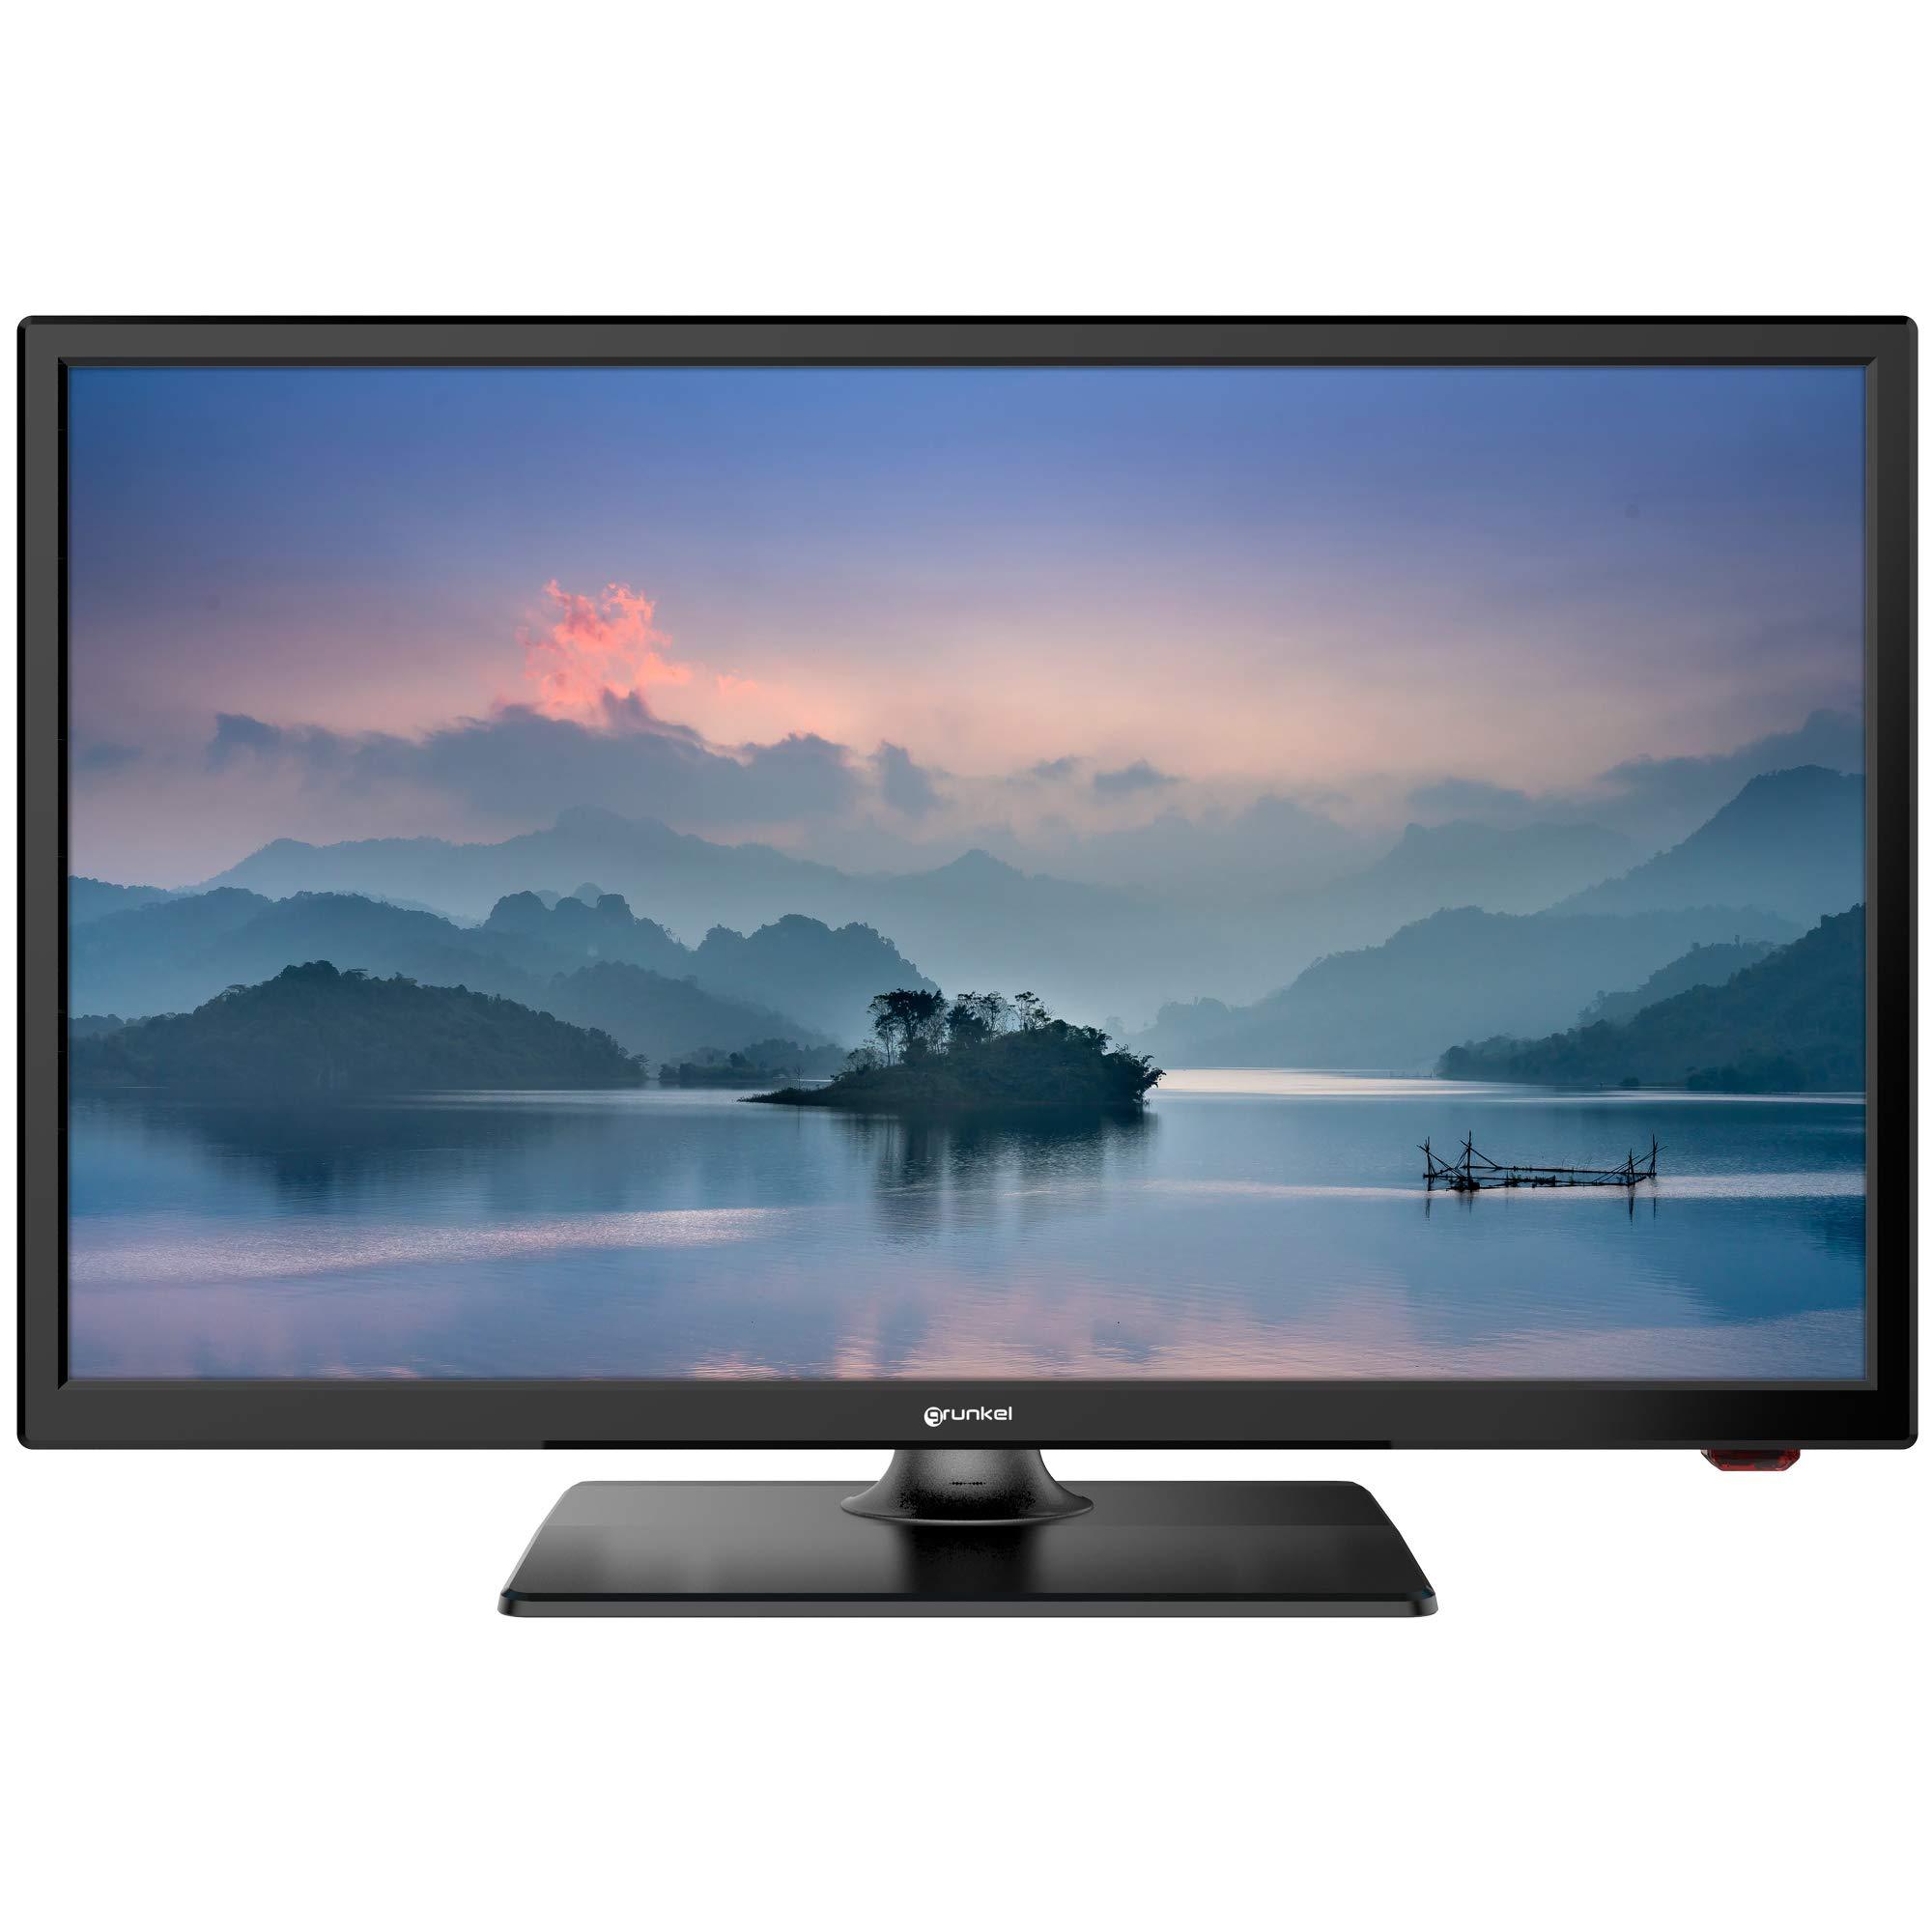 Grunkel - LED-24 IV2 - Televisor LED HD Ready Alta definición - 24 Pulgadas - Negro: Amazon.es: Electrónica